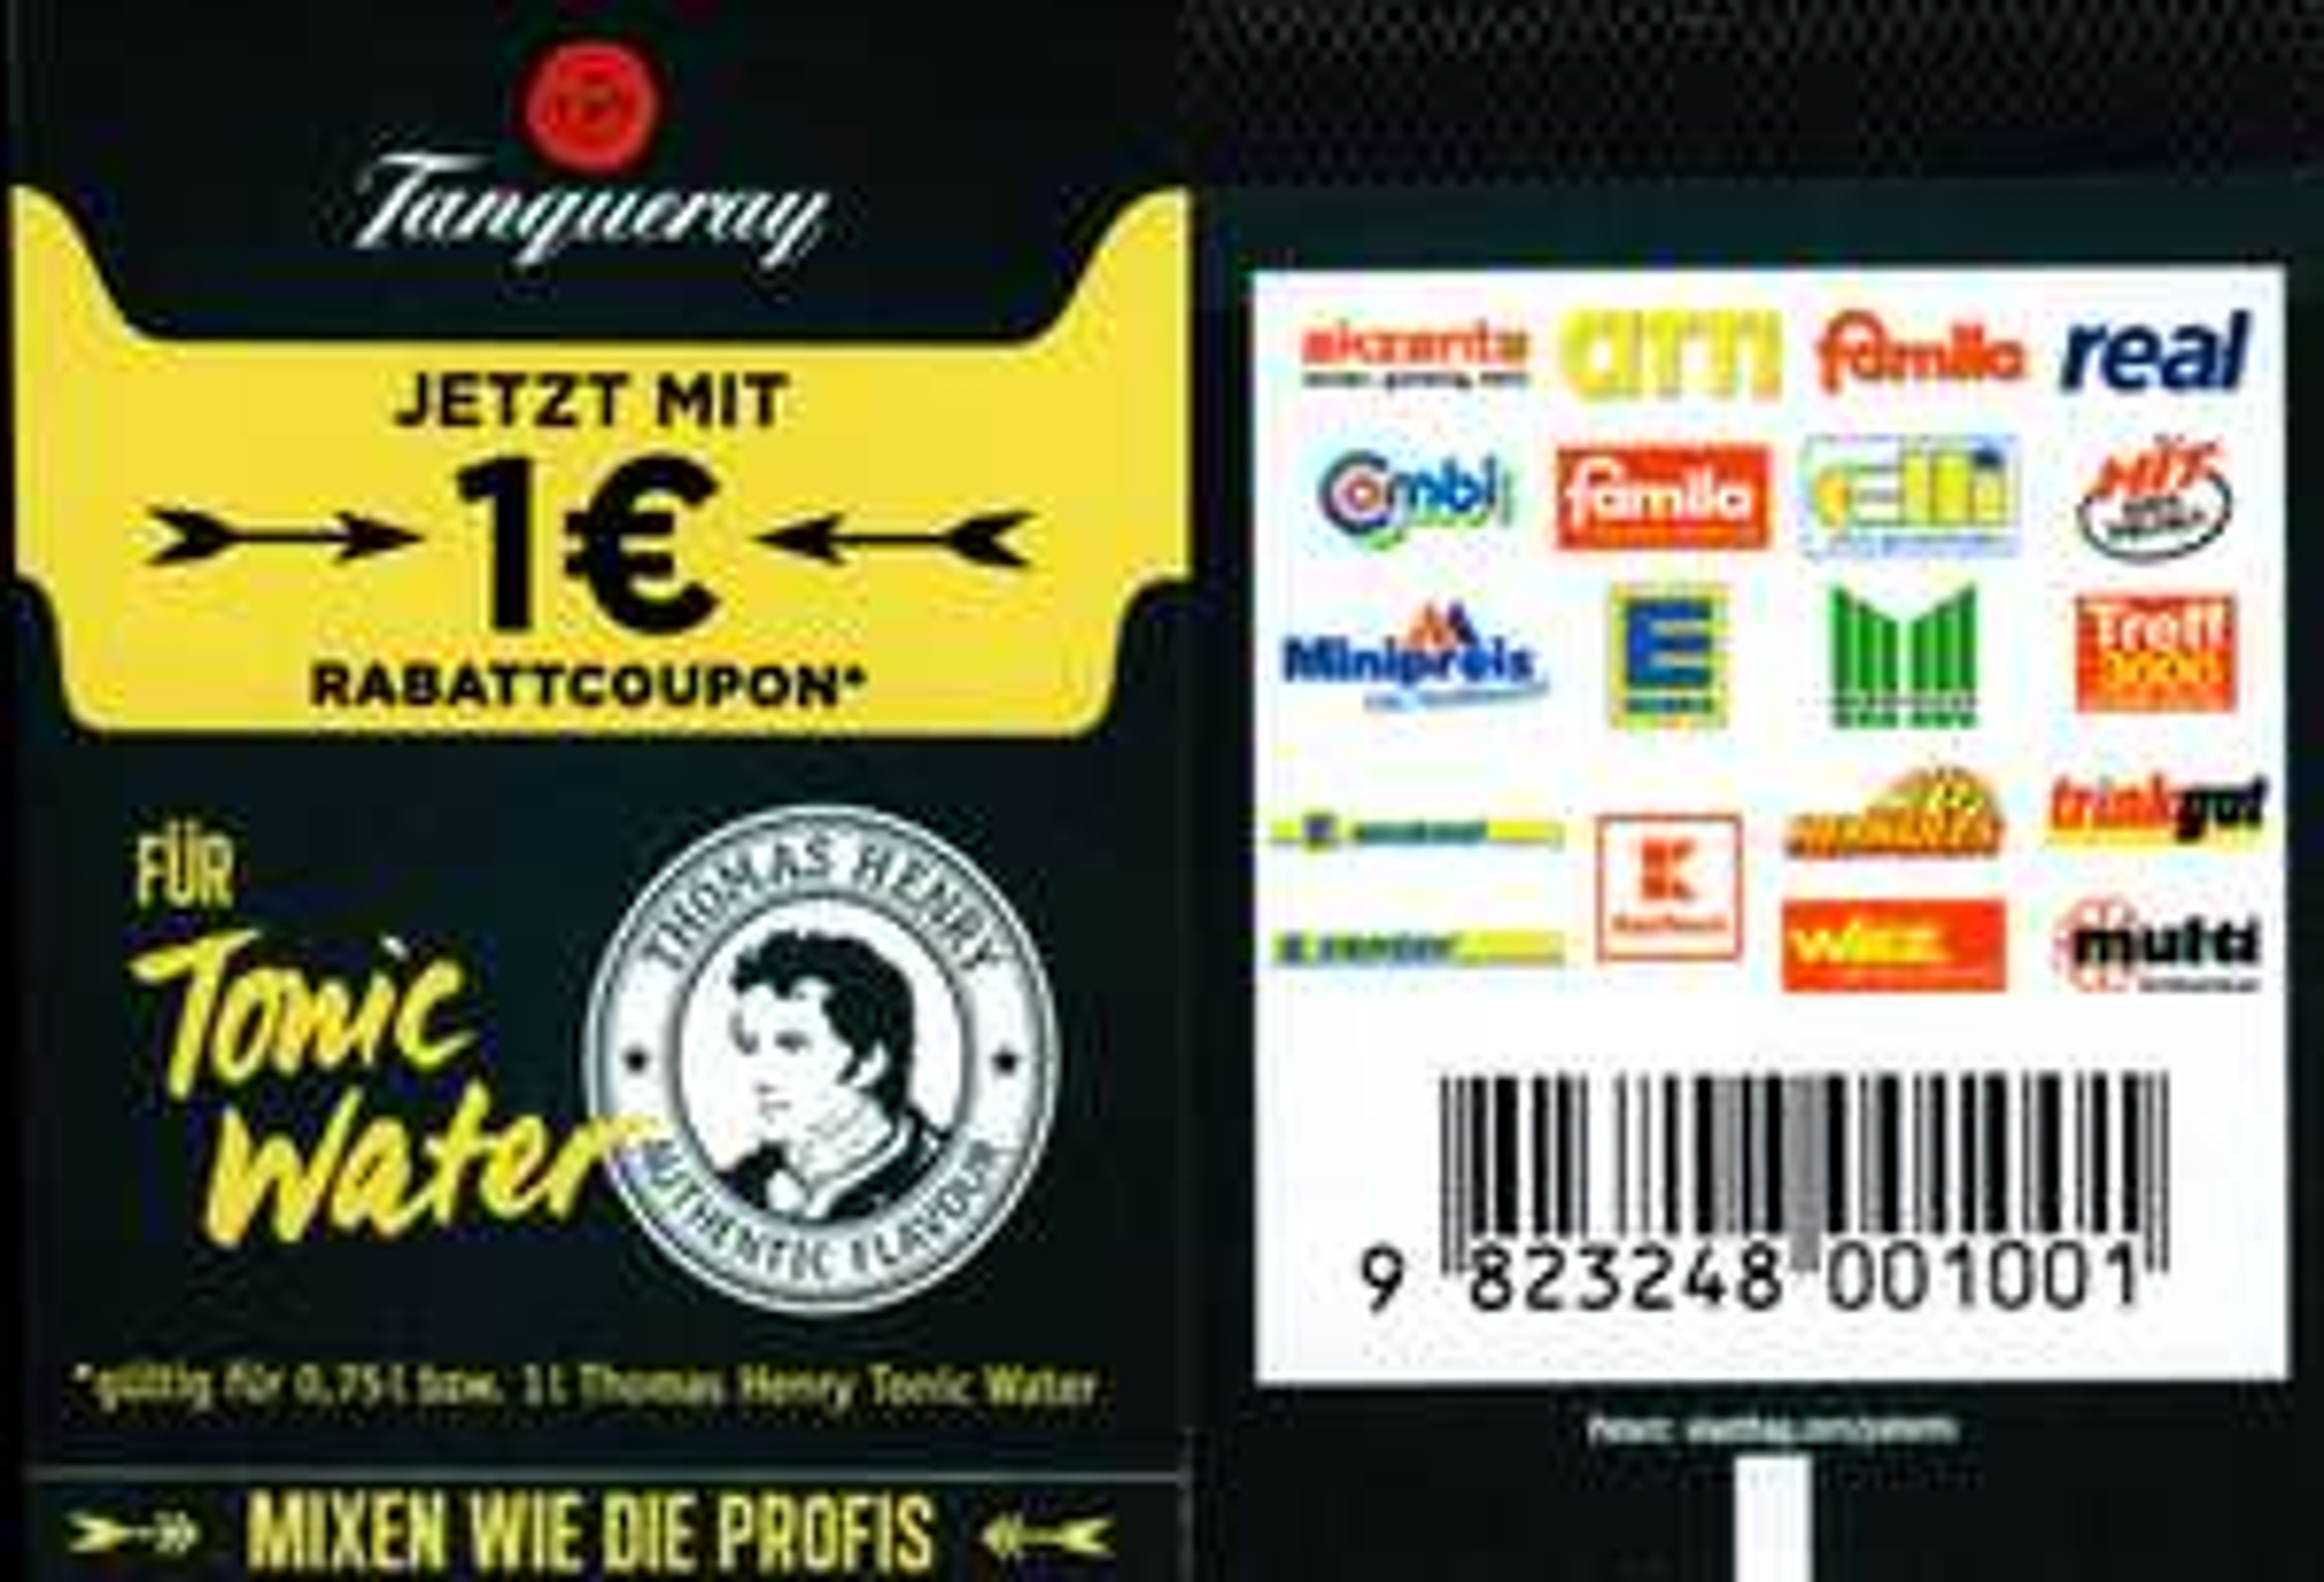 Neuer -1,00€ Coupon für 1x Tanqueray 0,7l + 1x Thomas Henry Tonic Water 0,75l/1,0l bis 31.08.2018